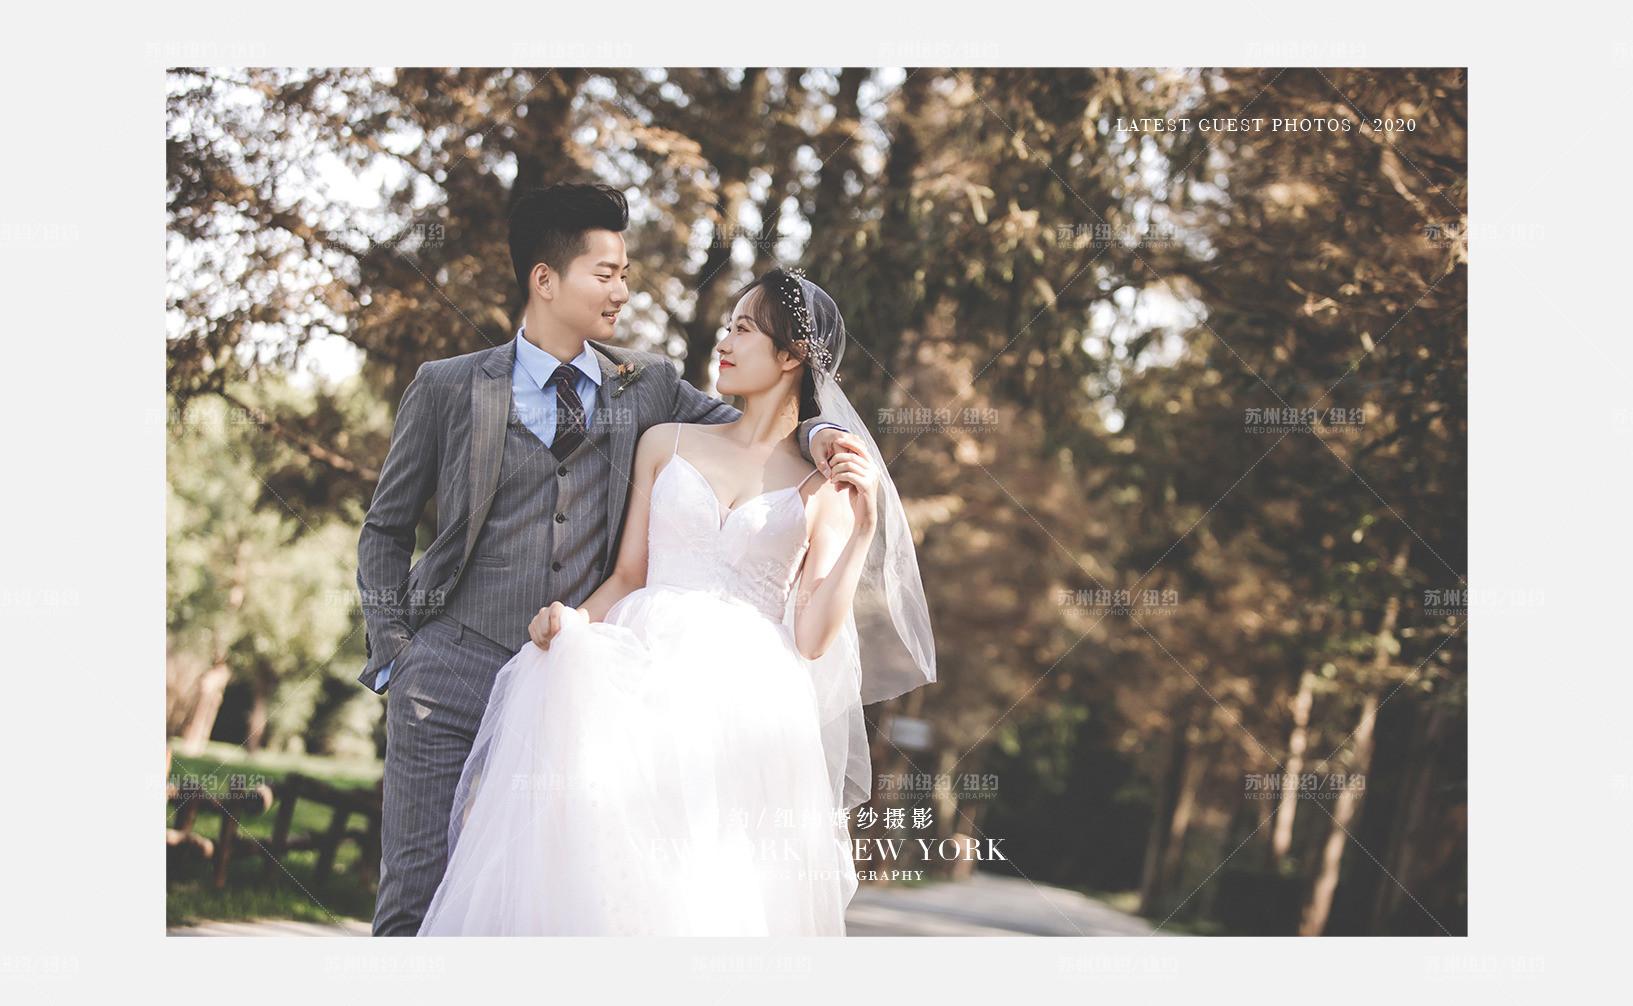 Mr.黄 & Ms.张(纽约纽约最新客照)婚纱摄影照